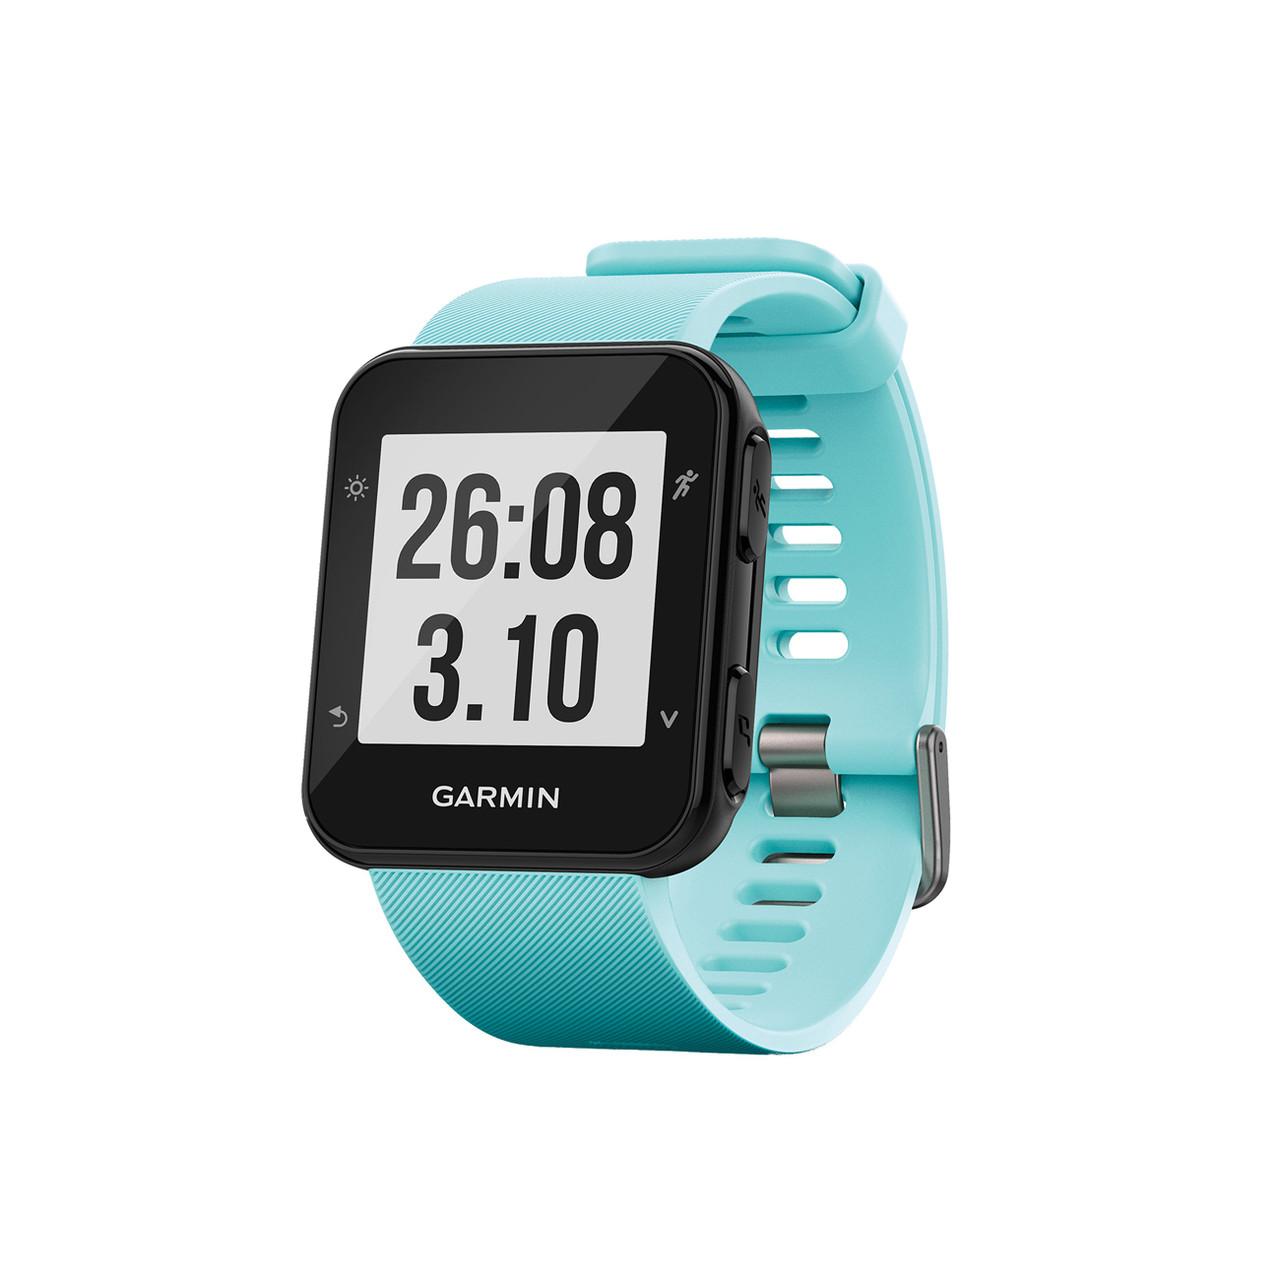 Спортивные часы Garmin Forerunner 35 Light Blue, цвет черный